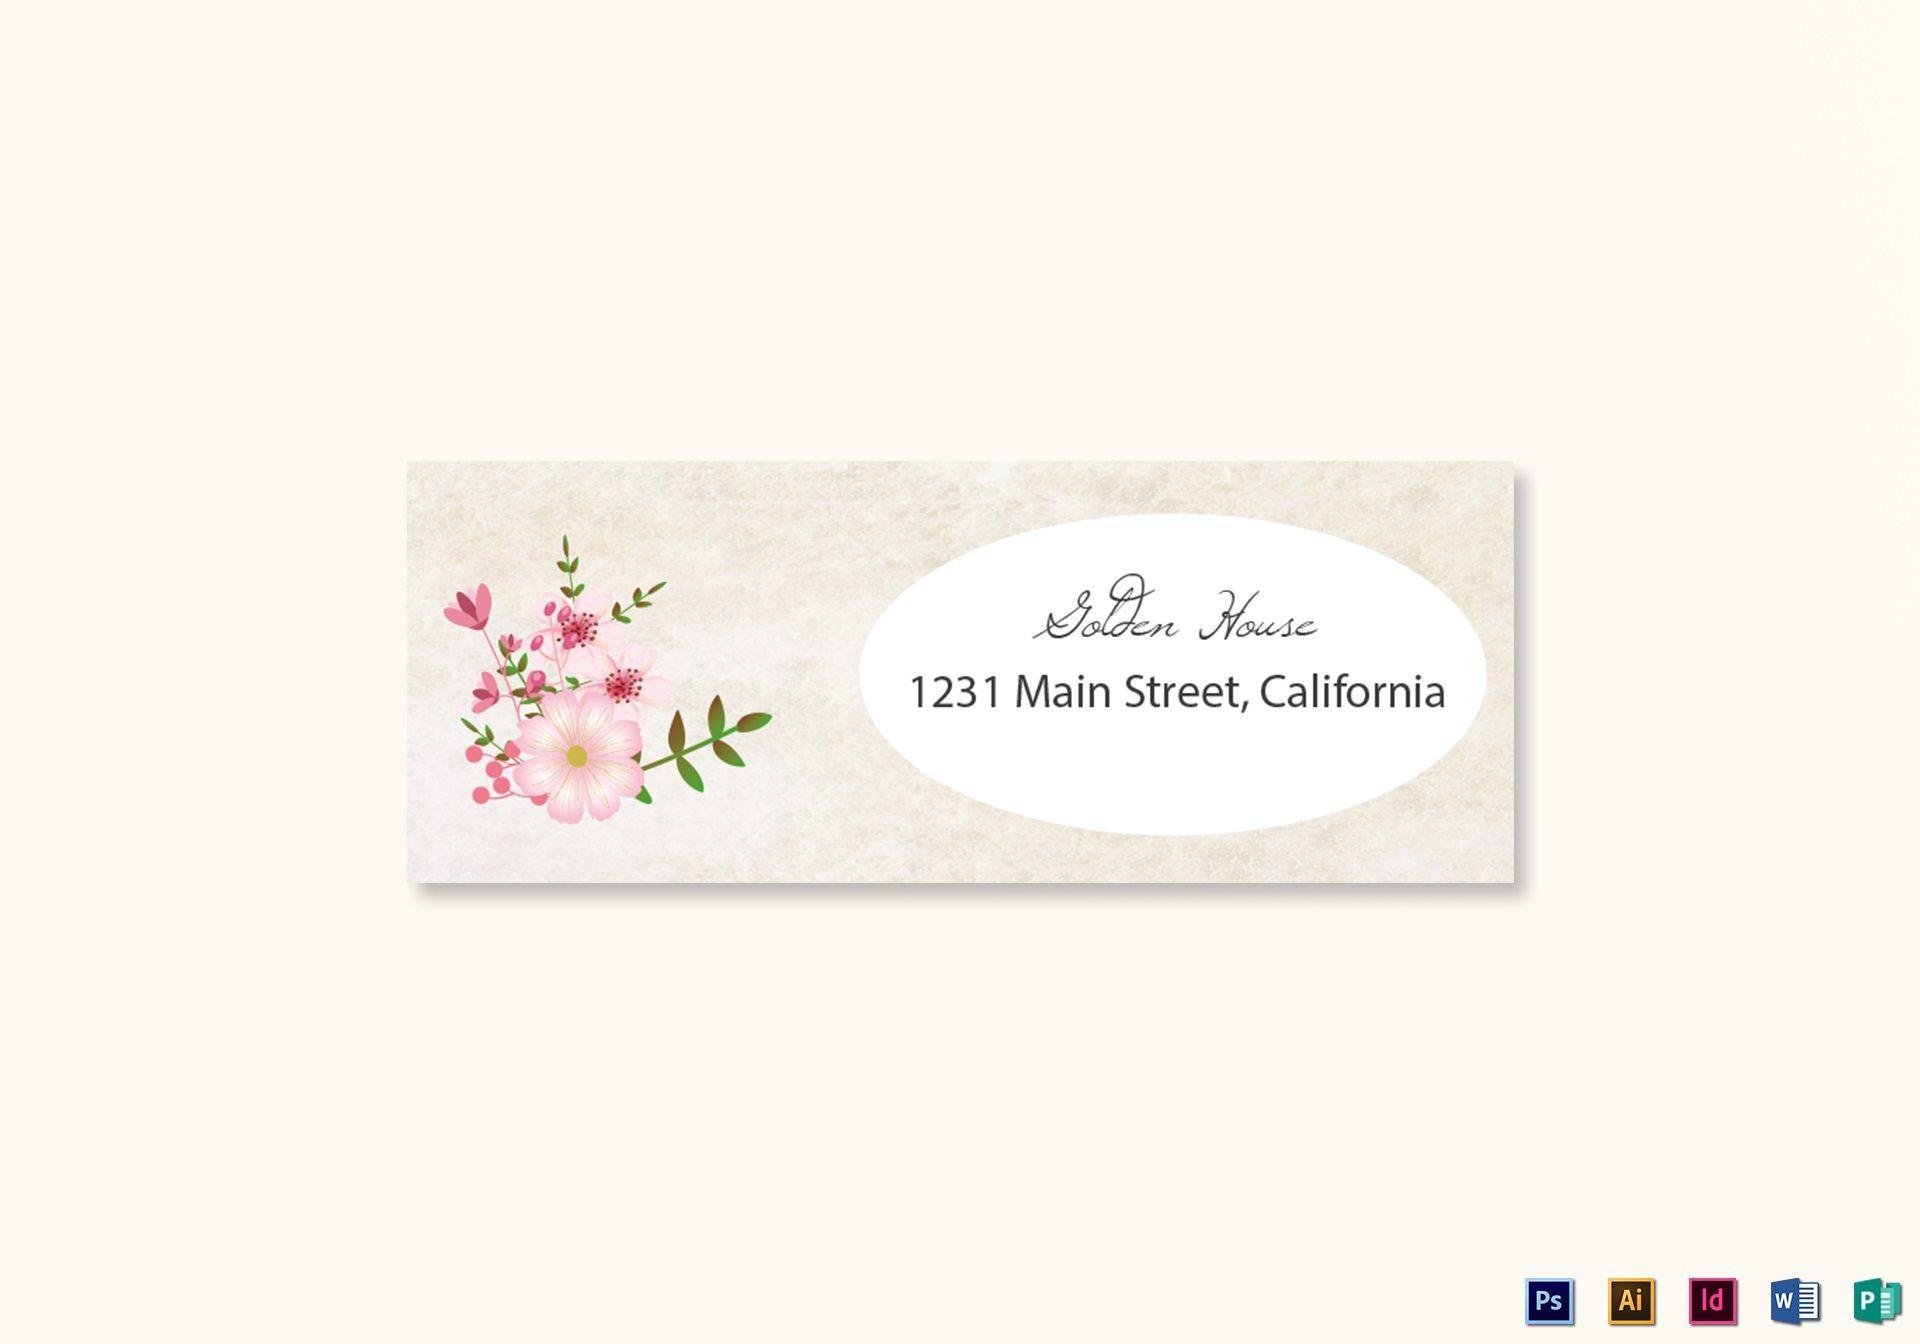 008 Marvelou Wedding Addres Label Template Design  Free Printable1920